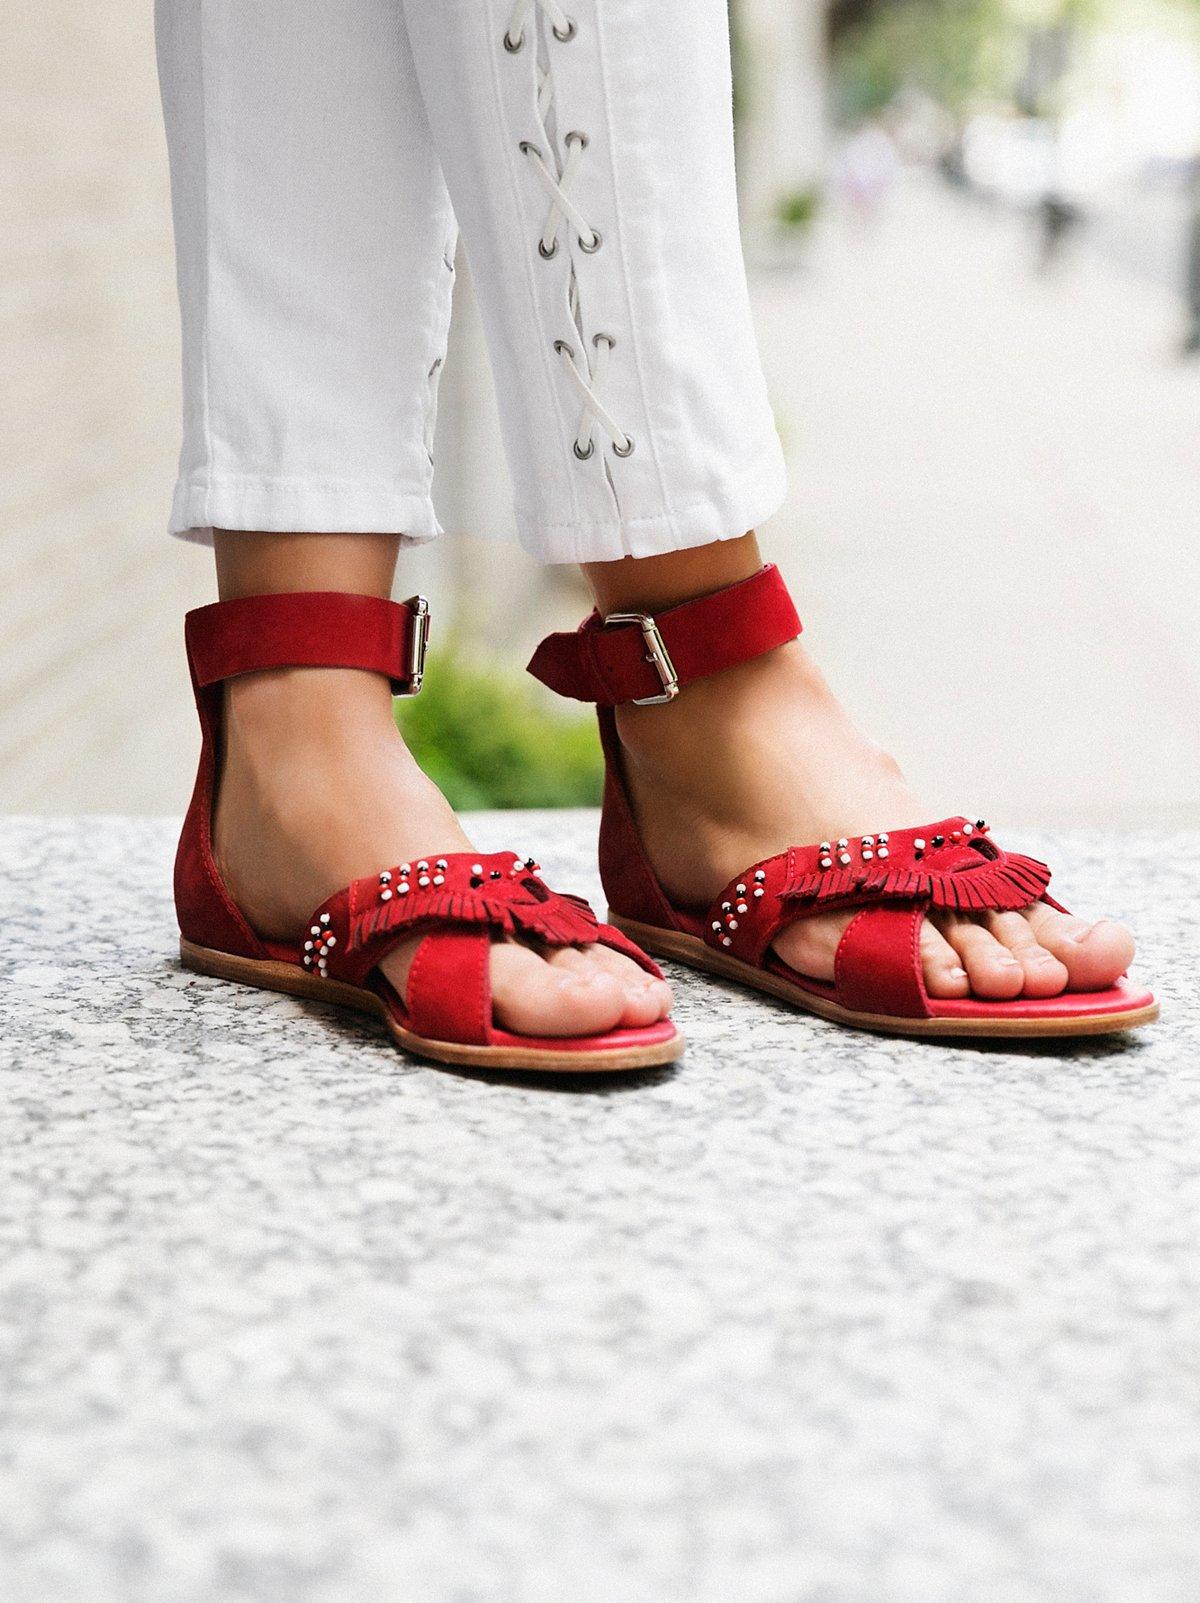 Mallie凉鞋